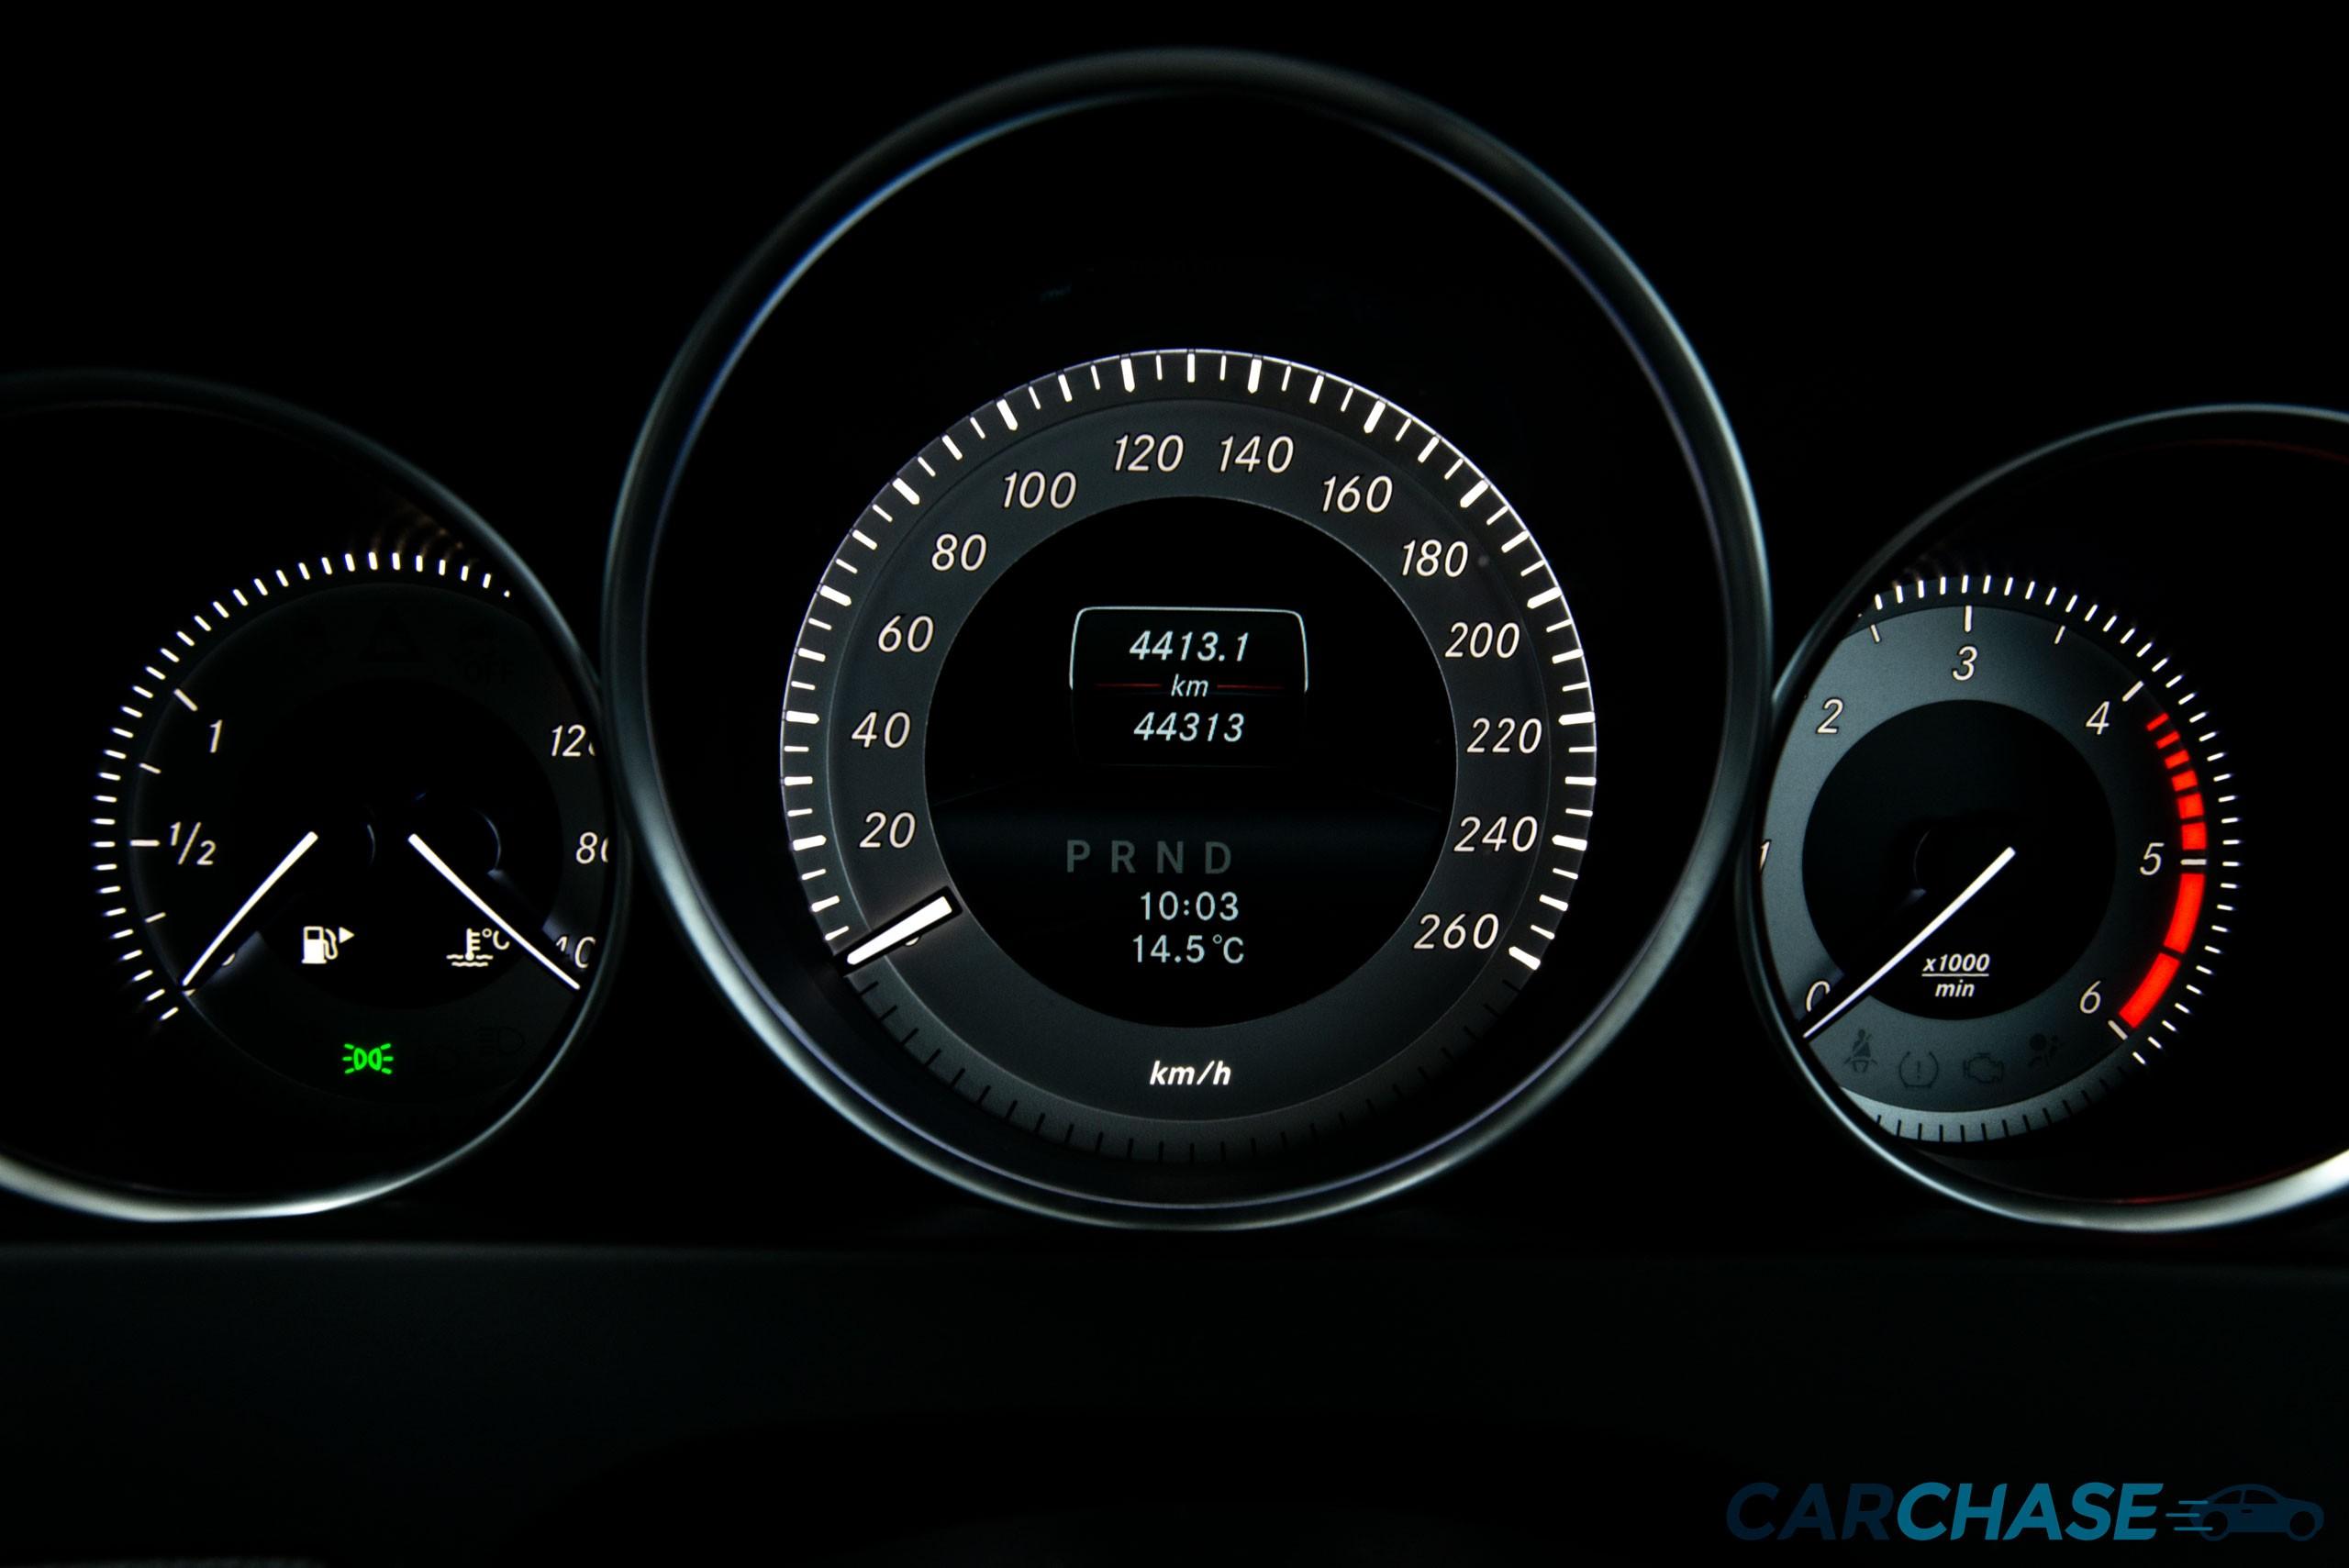 Image of dials profile of 2015 Mercedes-Benz C250 CDi Avantgarde